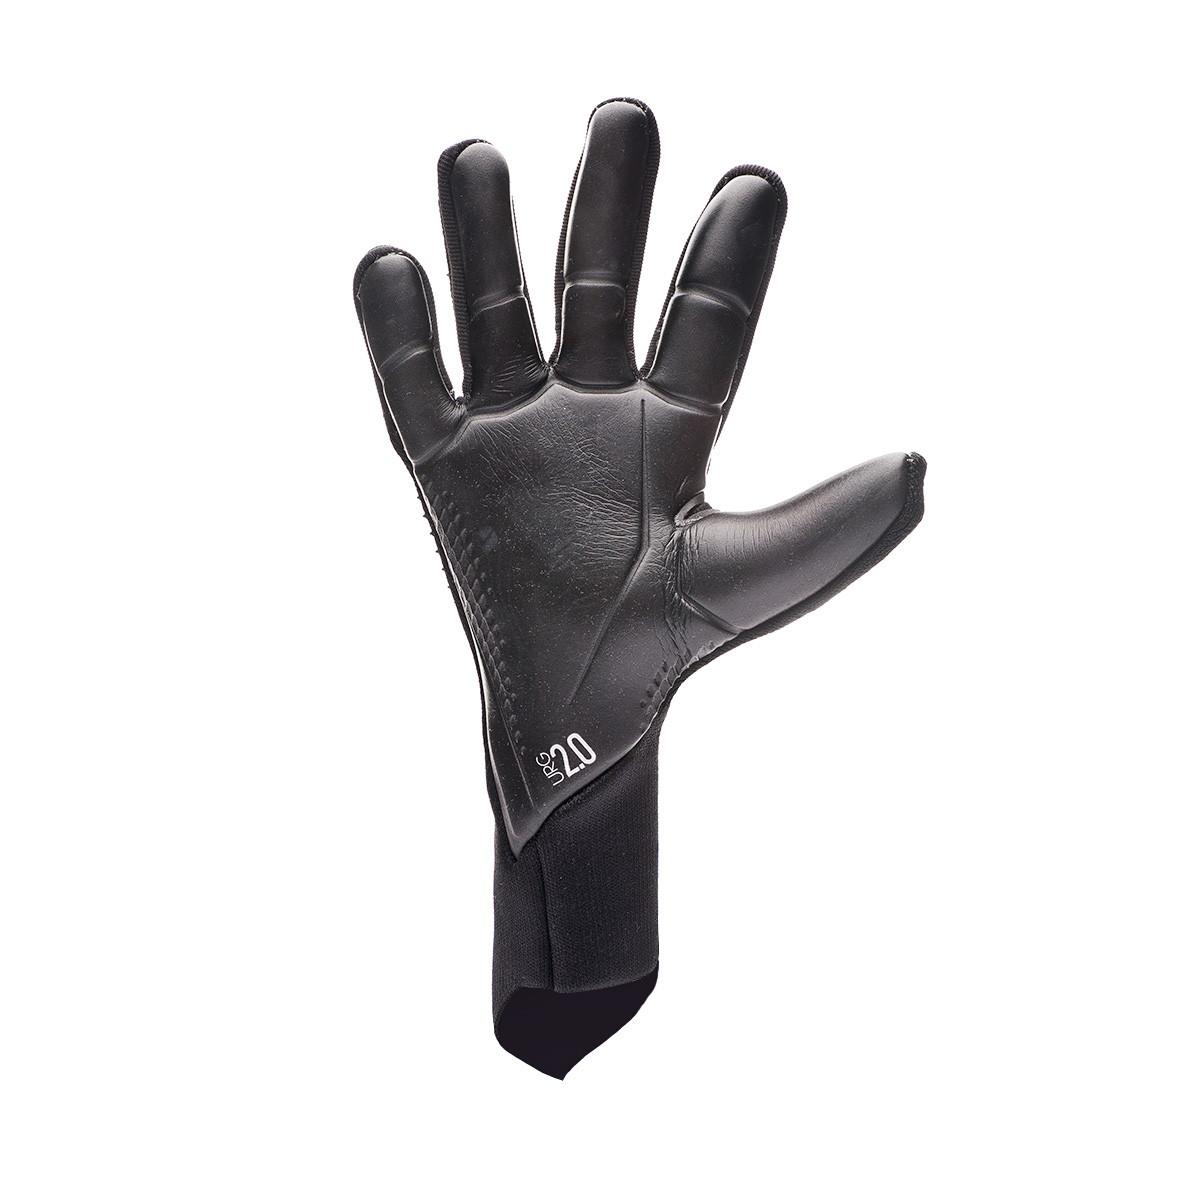 Grip Tests Molhado Luva URG 1.0 Adidas Predator Pro Promo